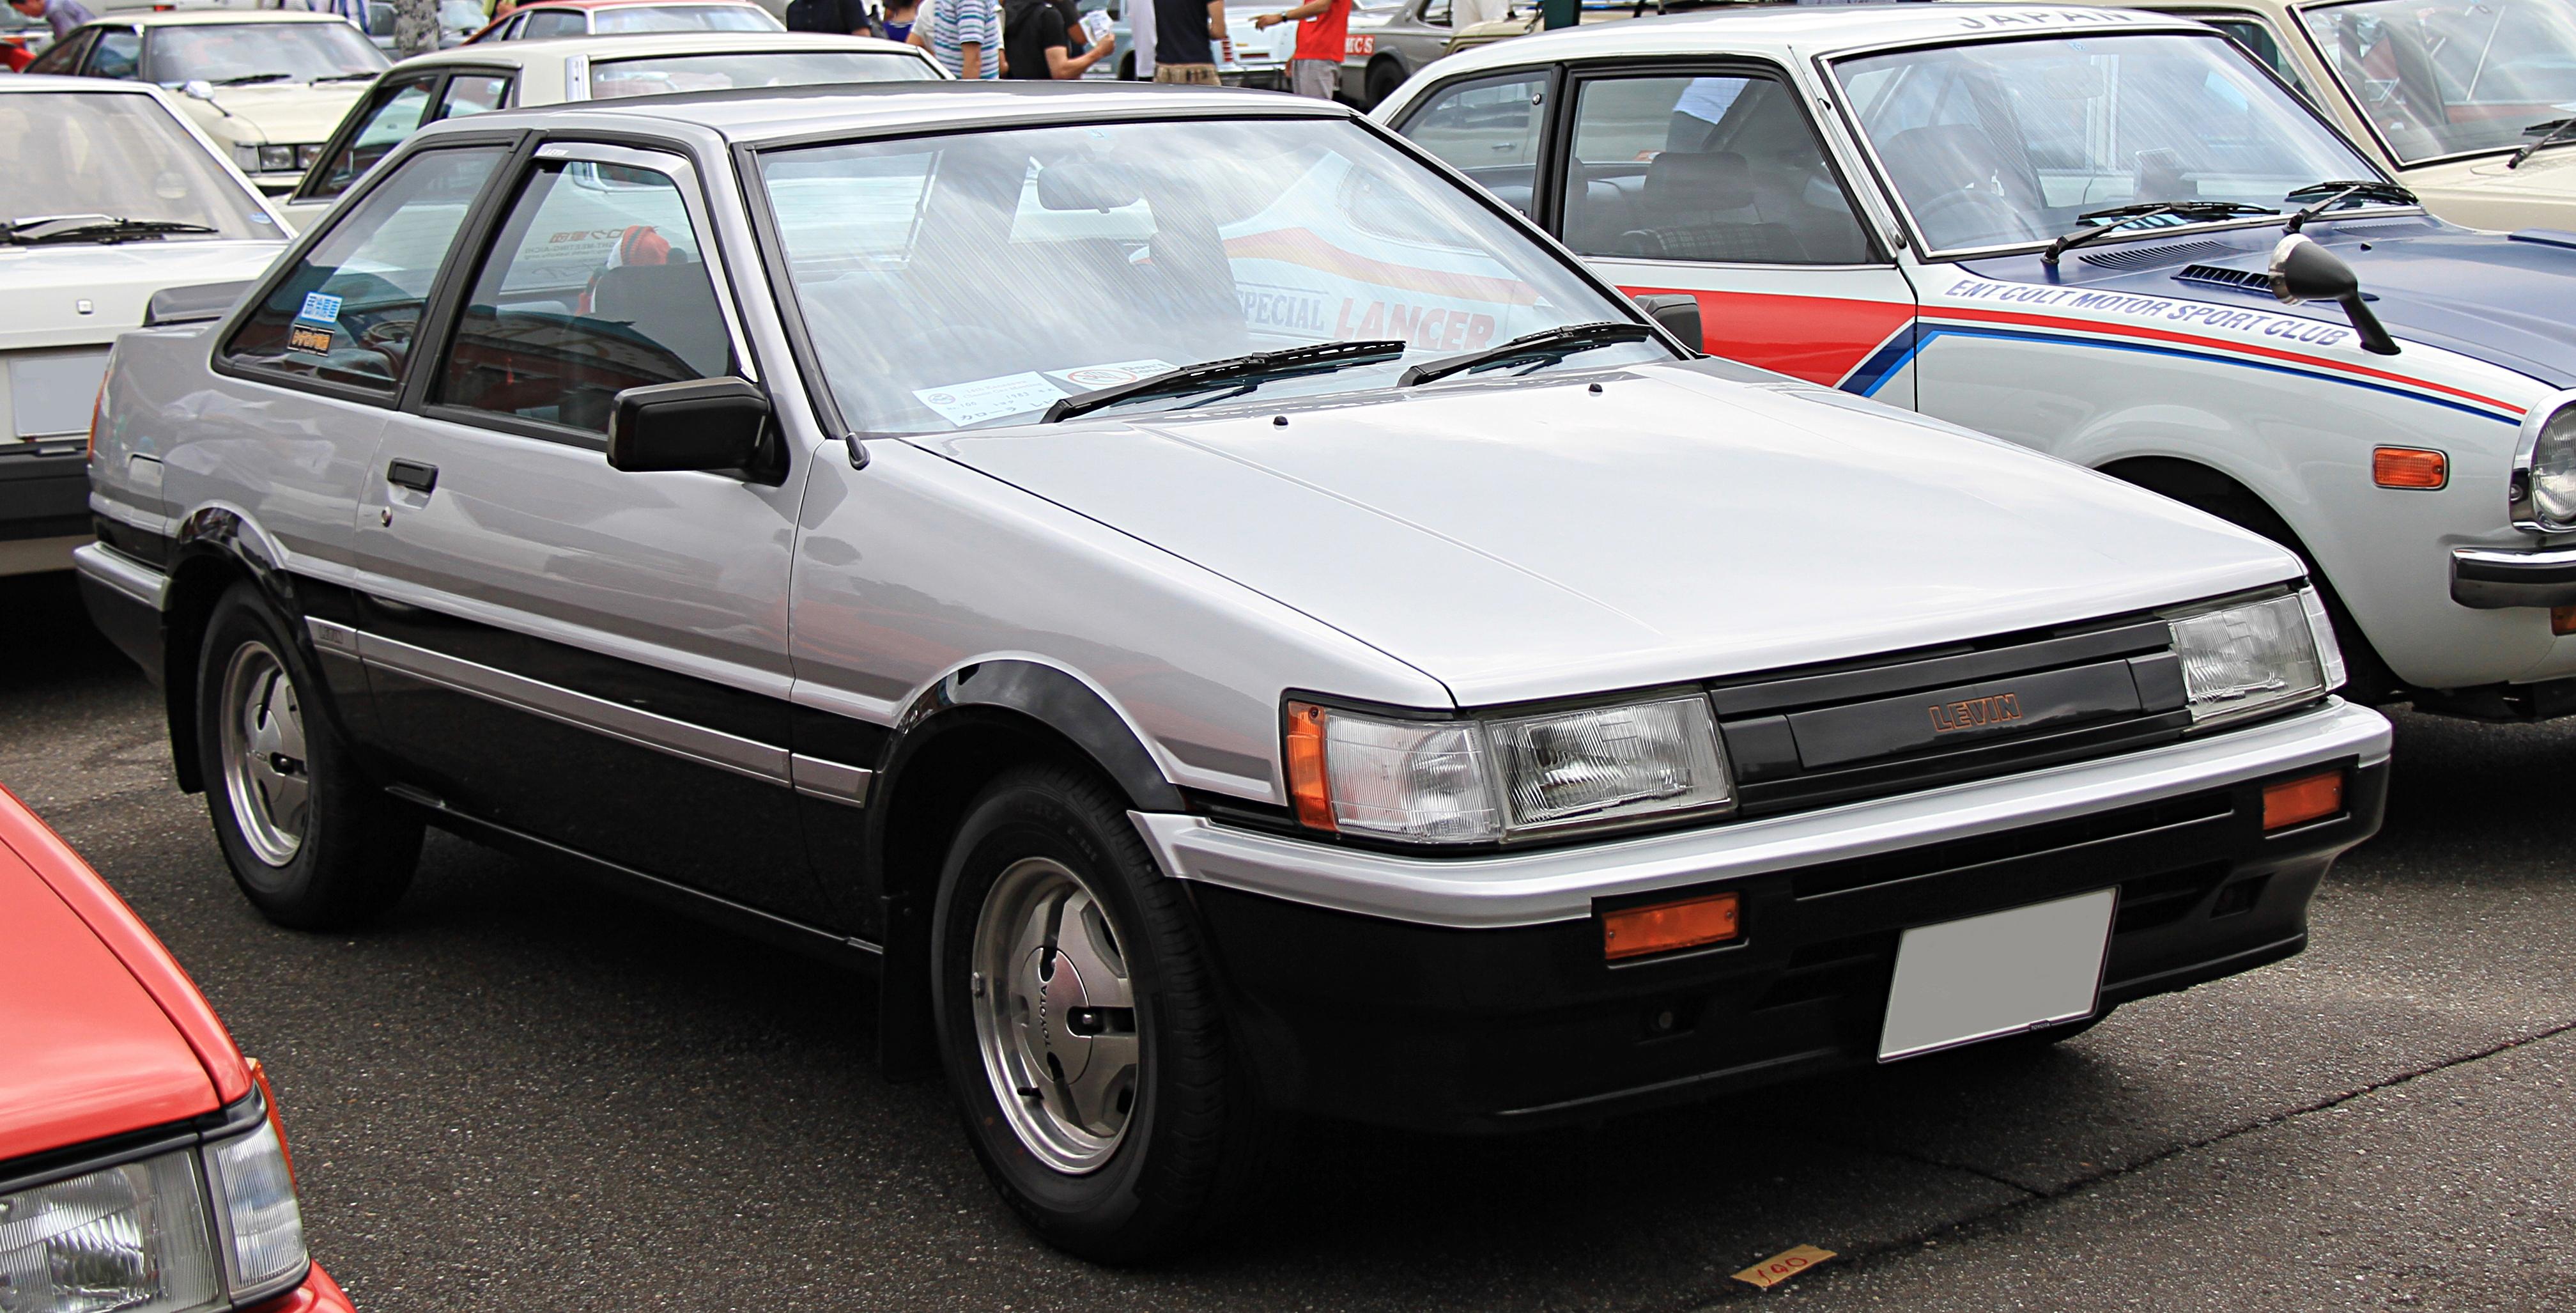 Kelebihan Toyota Sprinter Trueno Perbandingan Harga